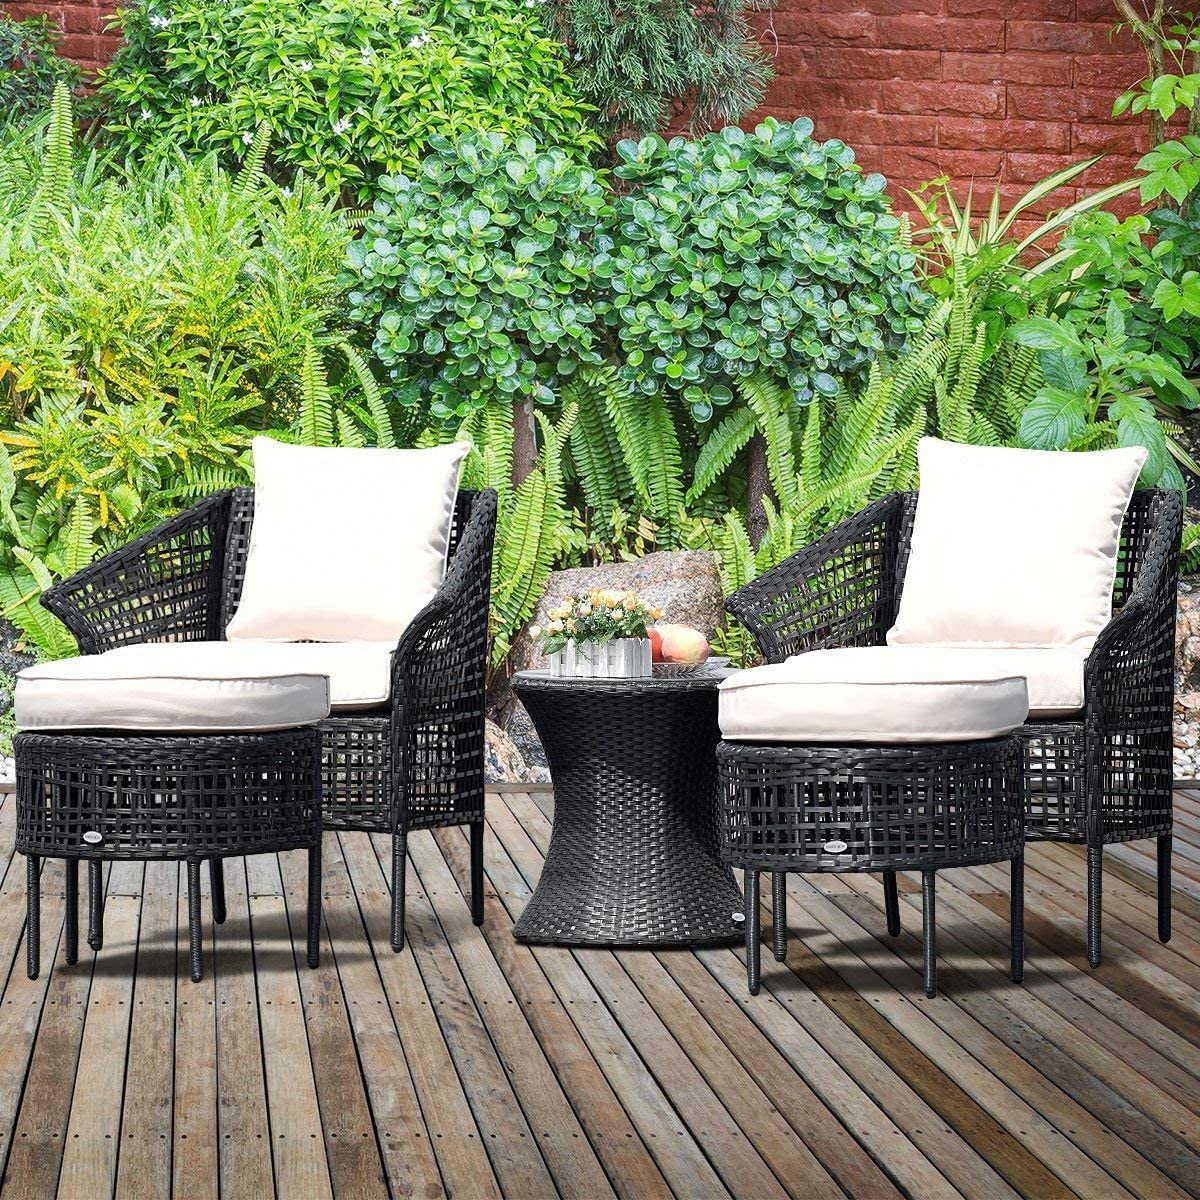 Tangkula 5 PCS Patio Rattan Sofa Ottoman Furniture Set Outdoor Garden Lawn Wicker Rattan Conversation Sofa Set w Cushions Beige